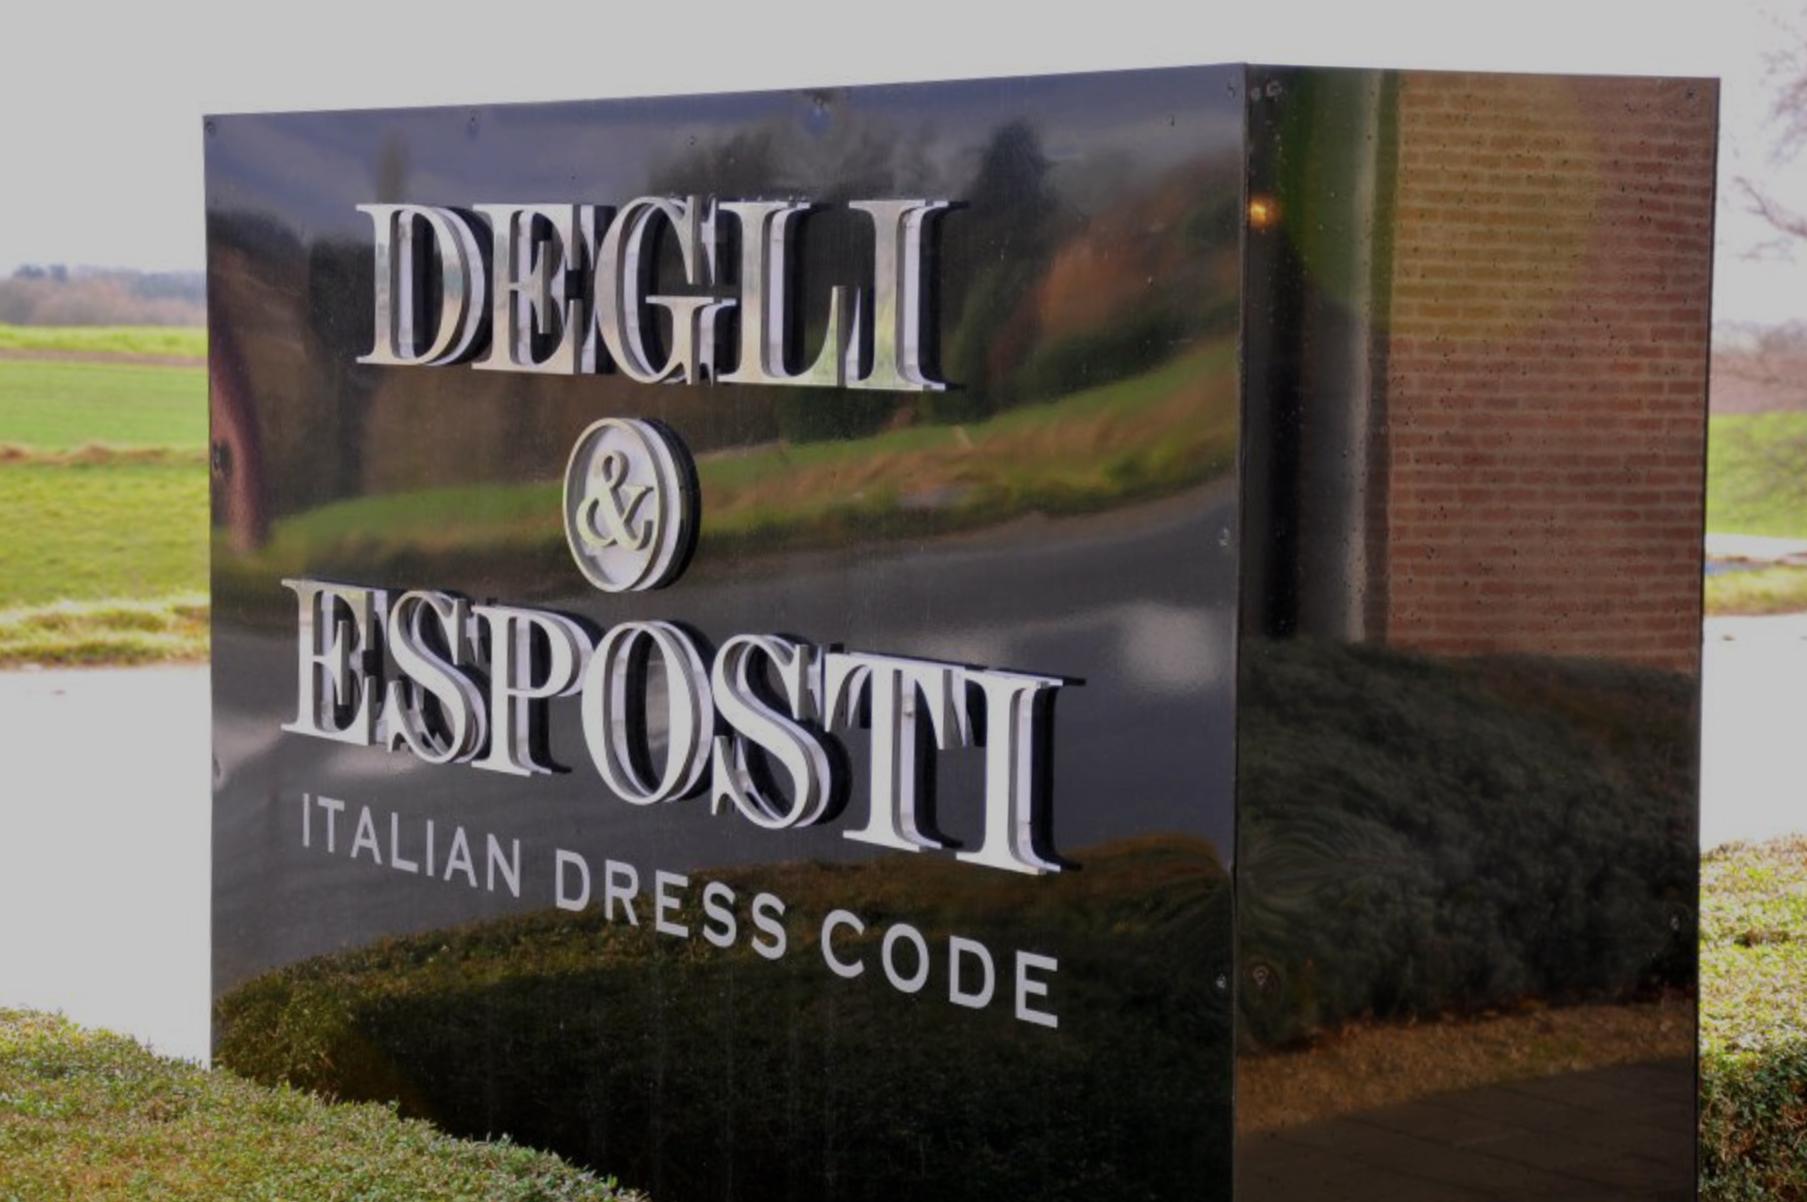 DEGLI&ESPOSTI - Chaussée de Louvain 2751410 Waterloo, BelgiumT. +32 (0)2 351 83 01